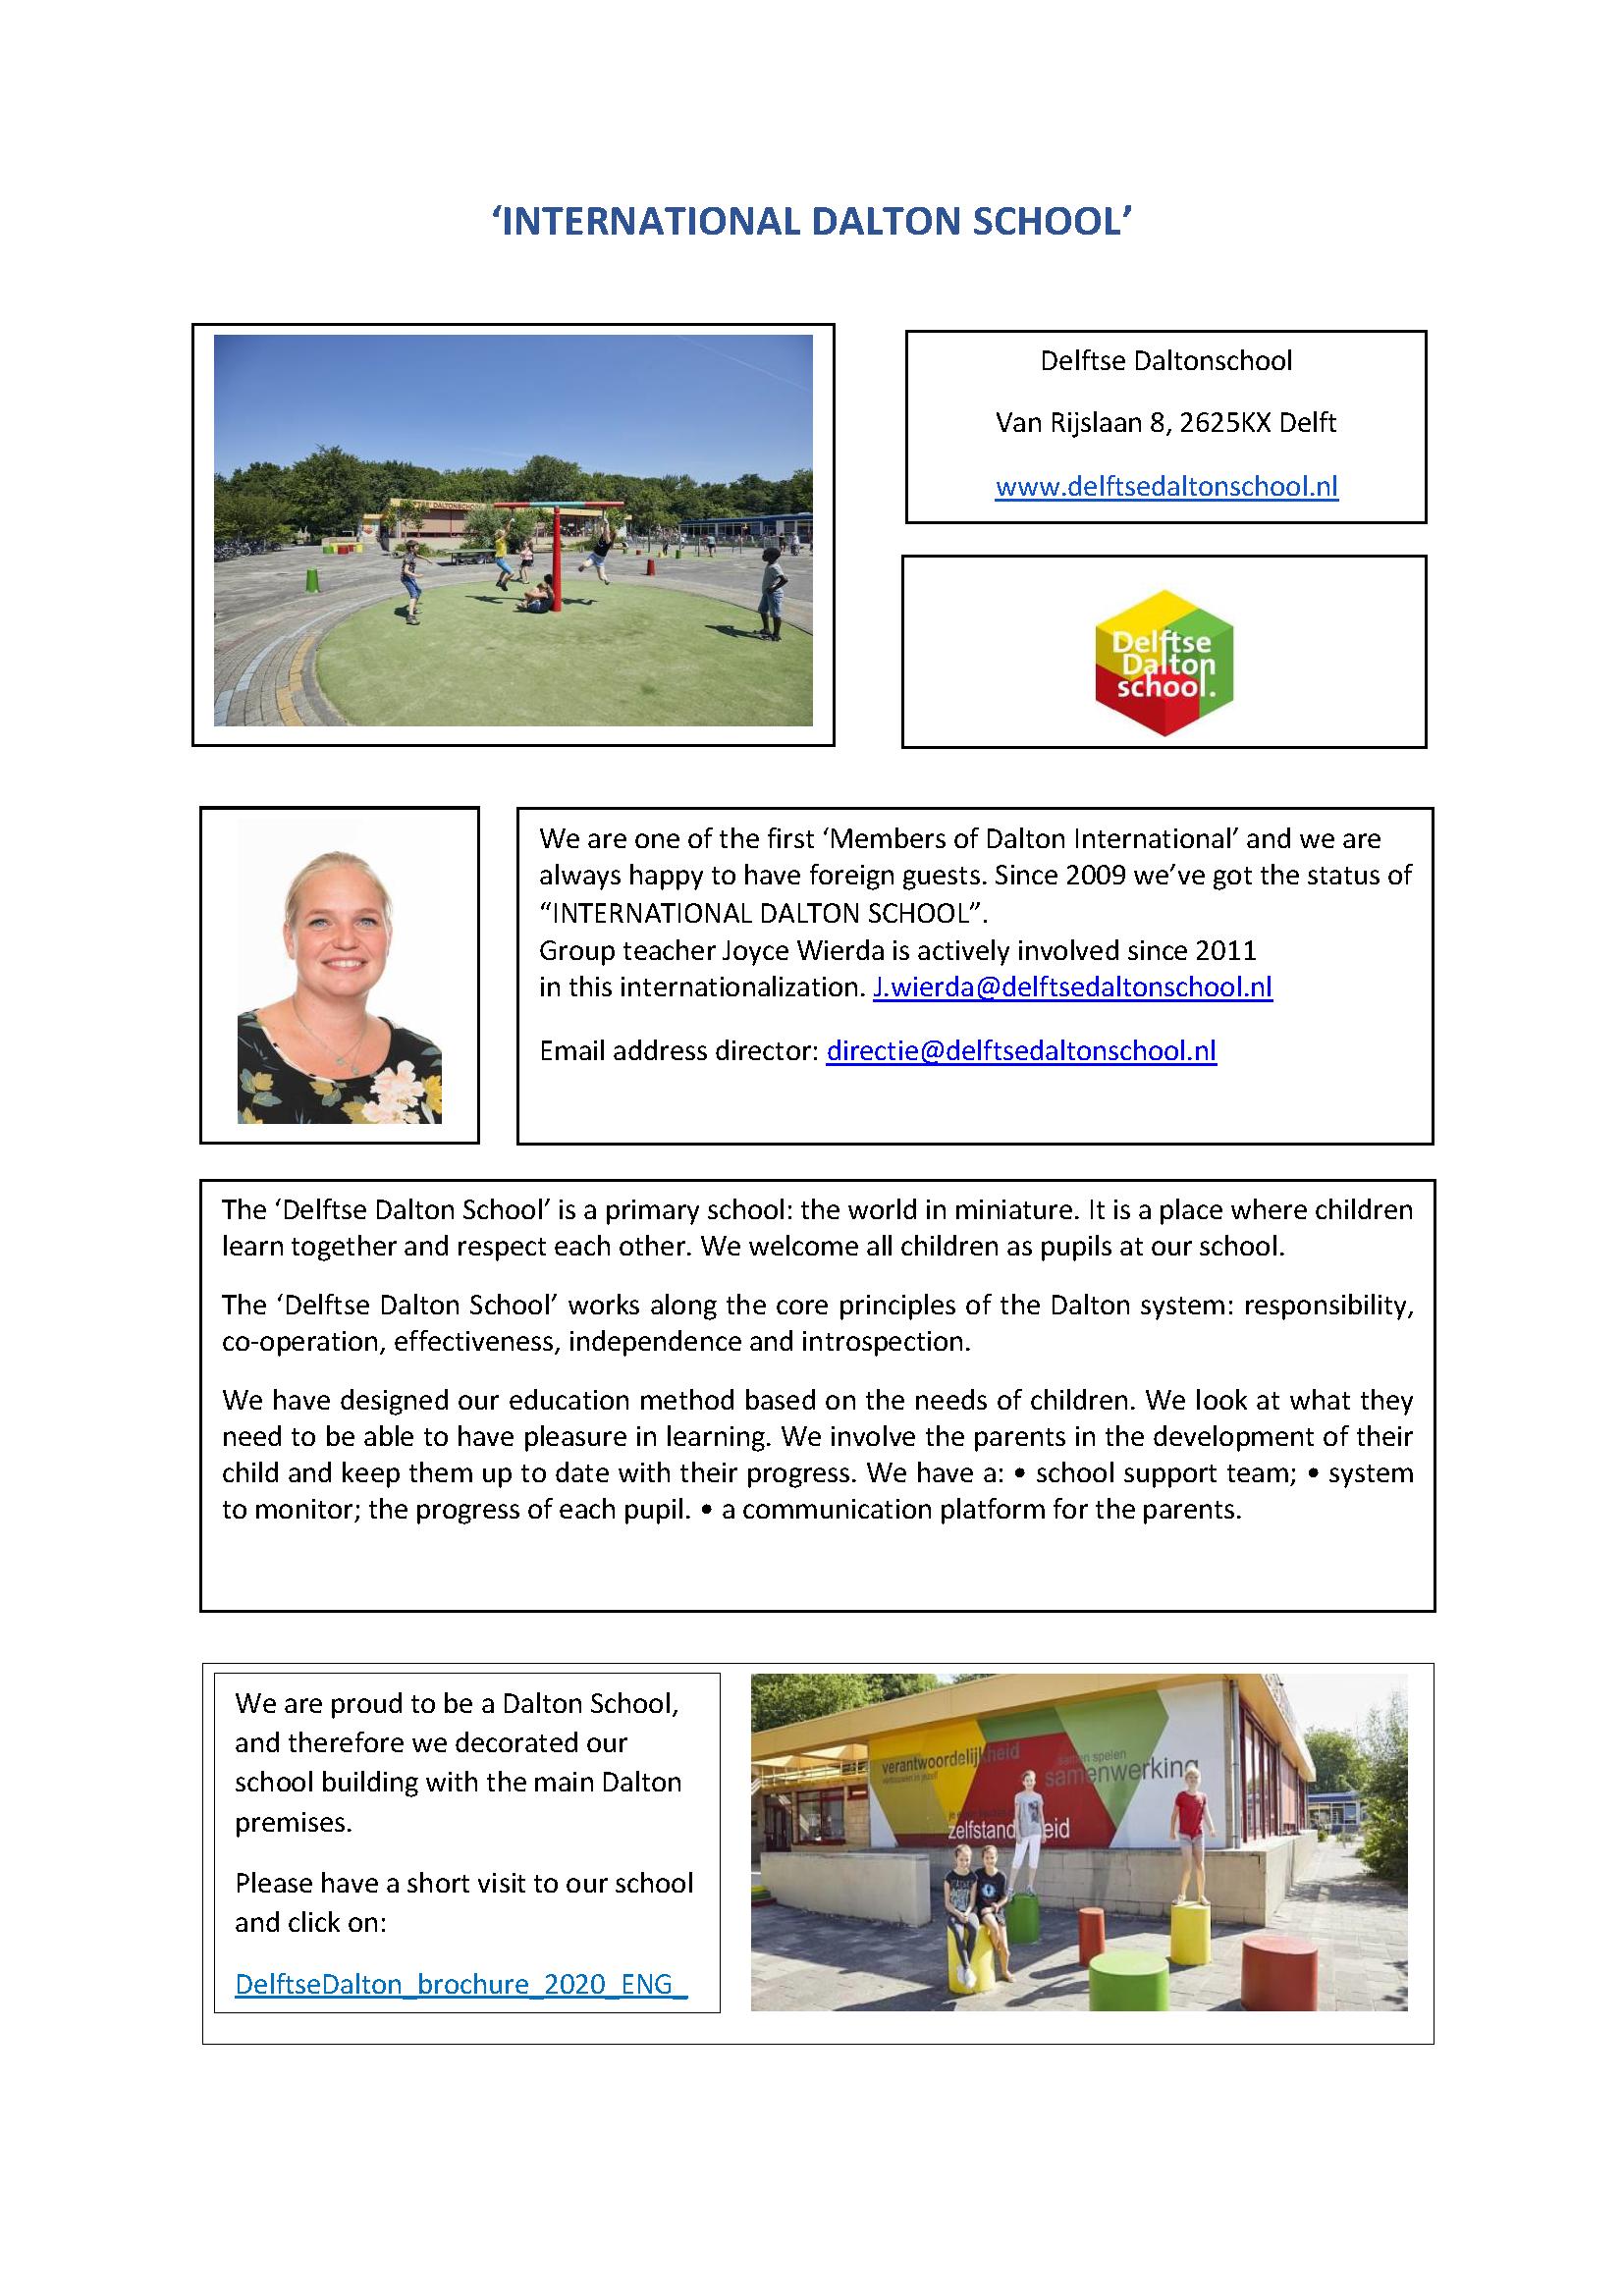 10 Delftse Daltonschool AS 'INTERNATIONAL DALTON SCHOOL'